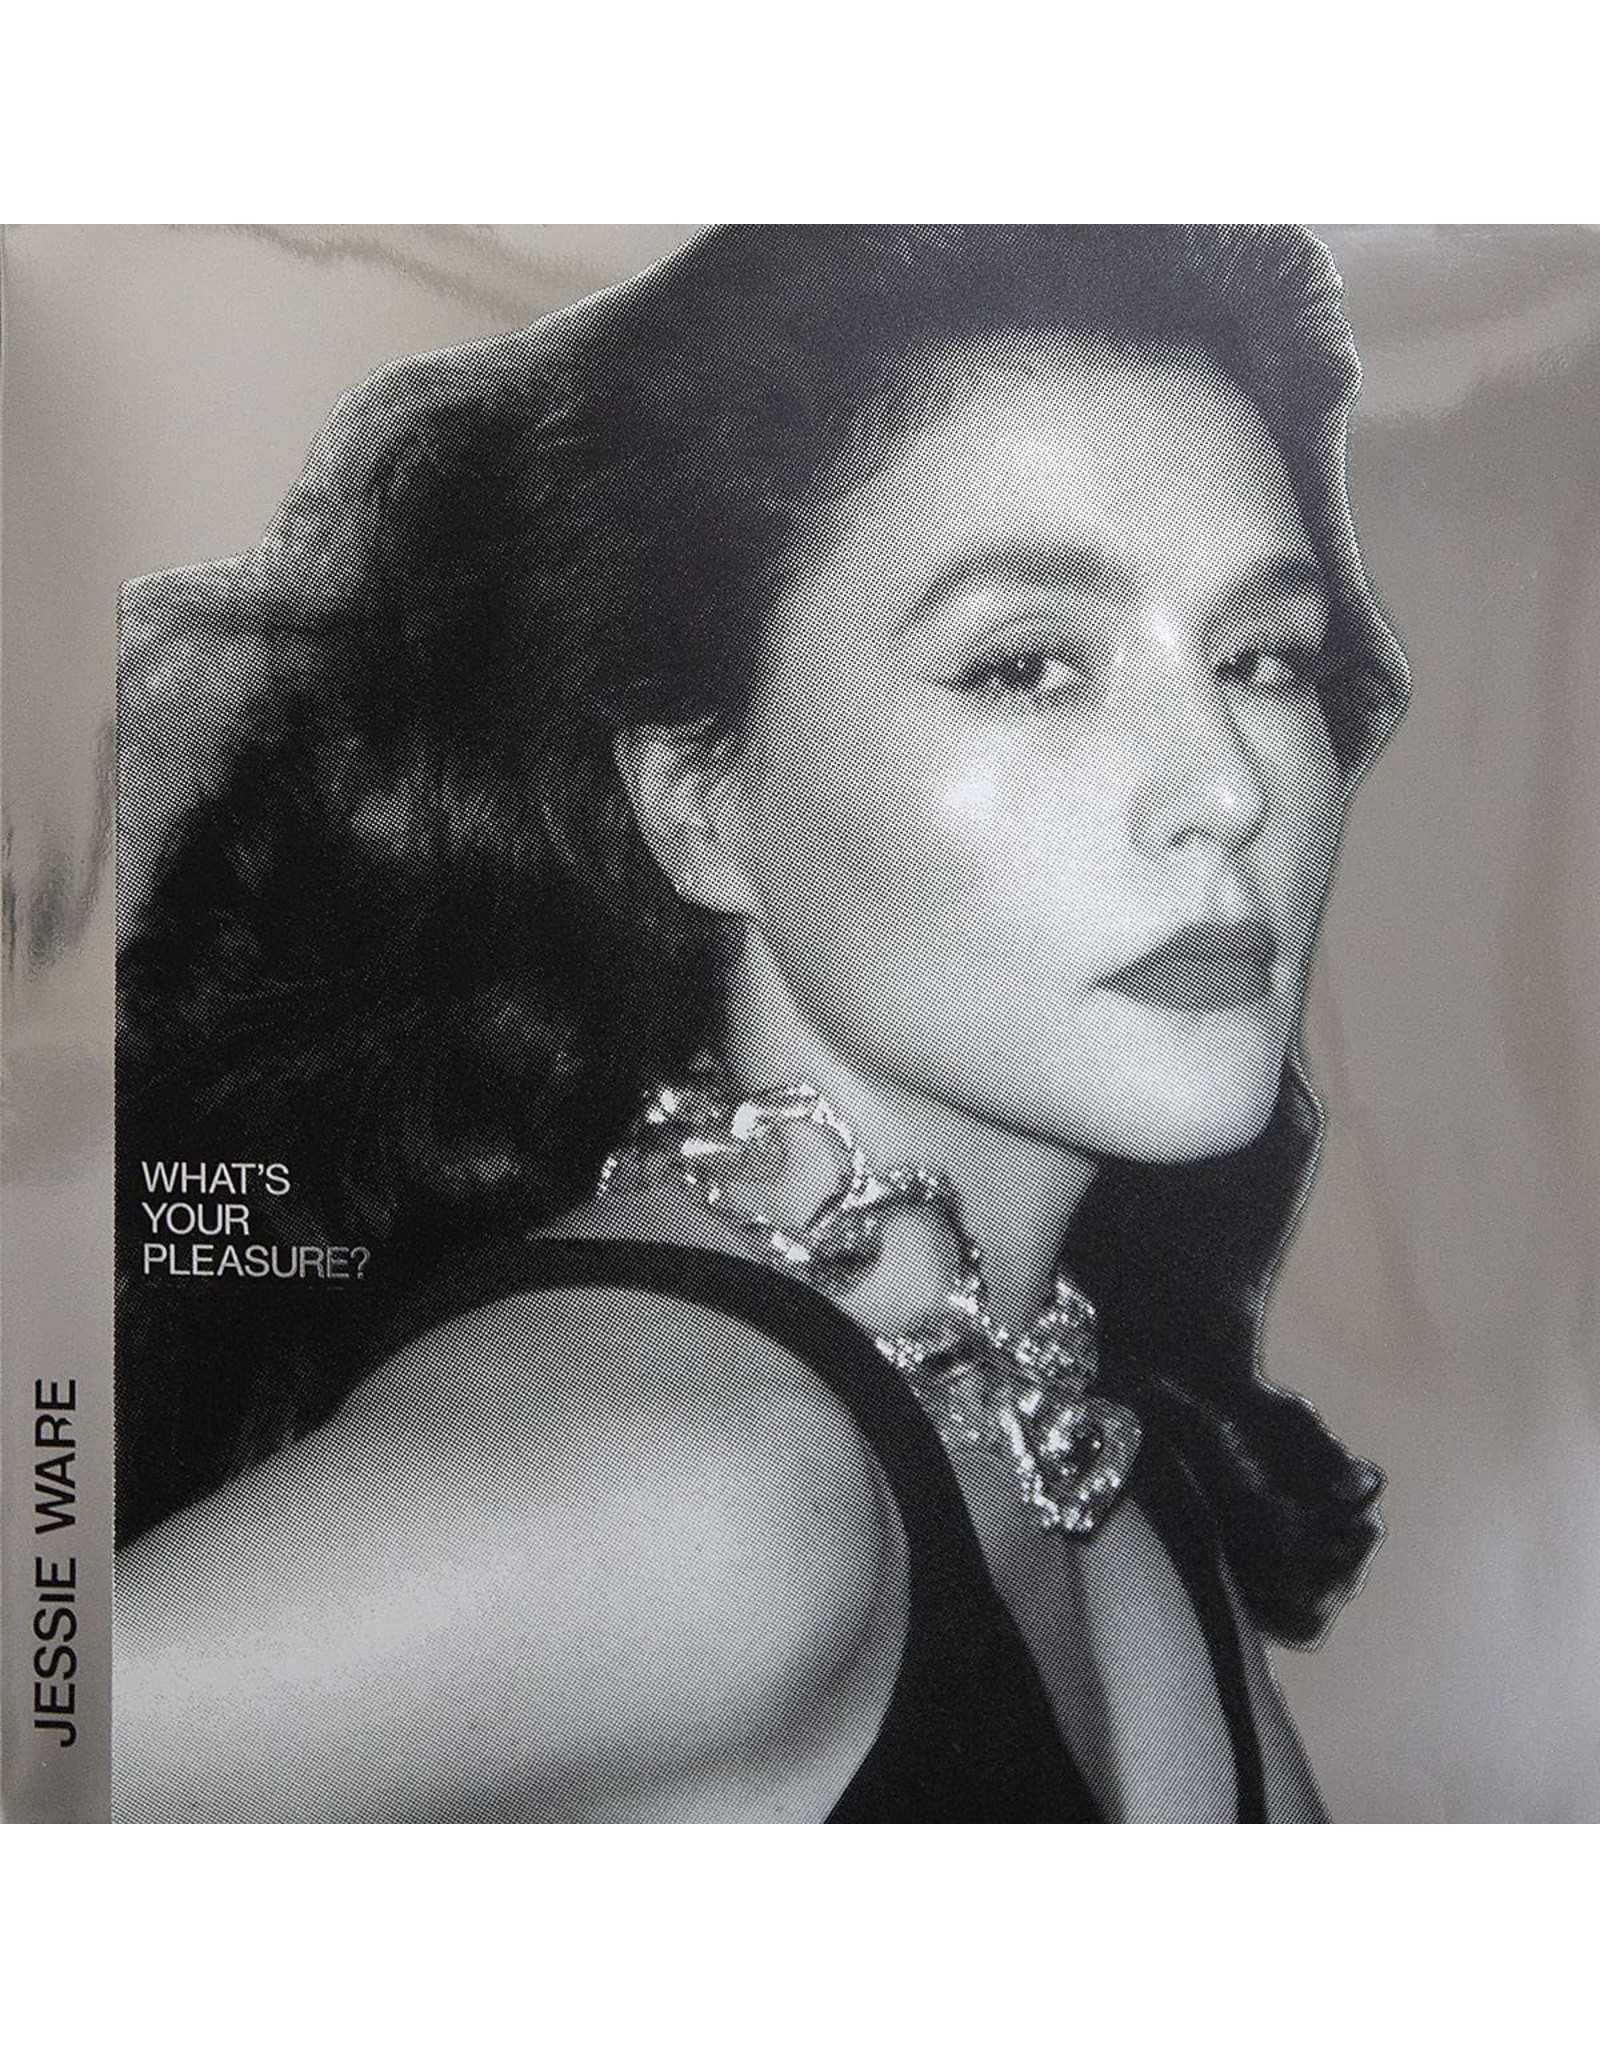 Jessie Ware - What's Your Pleasure (Platinum Pleasure Edition)